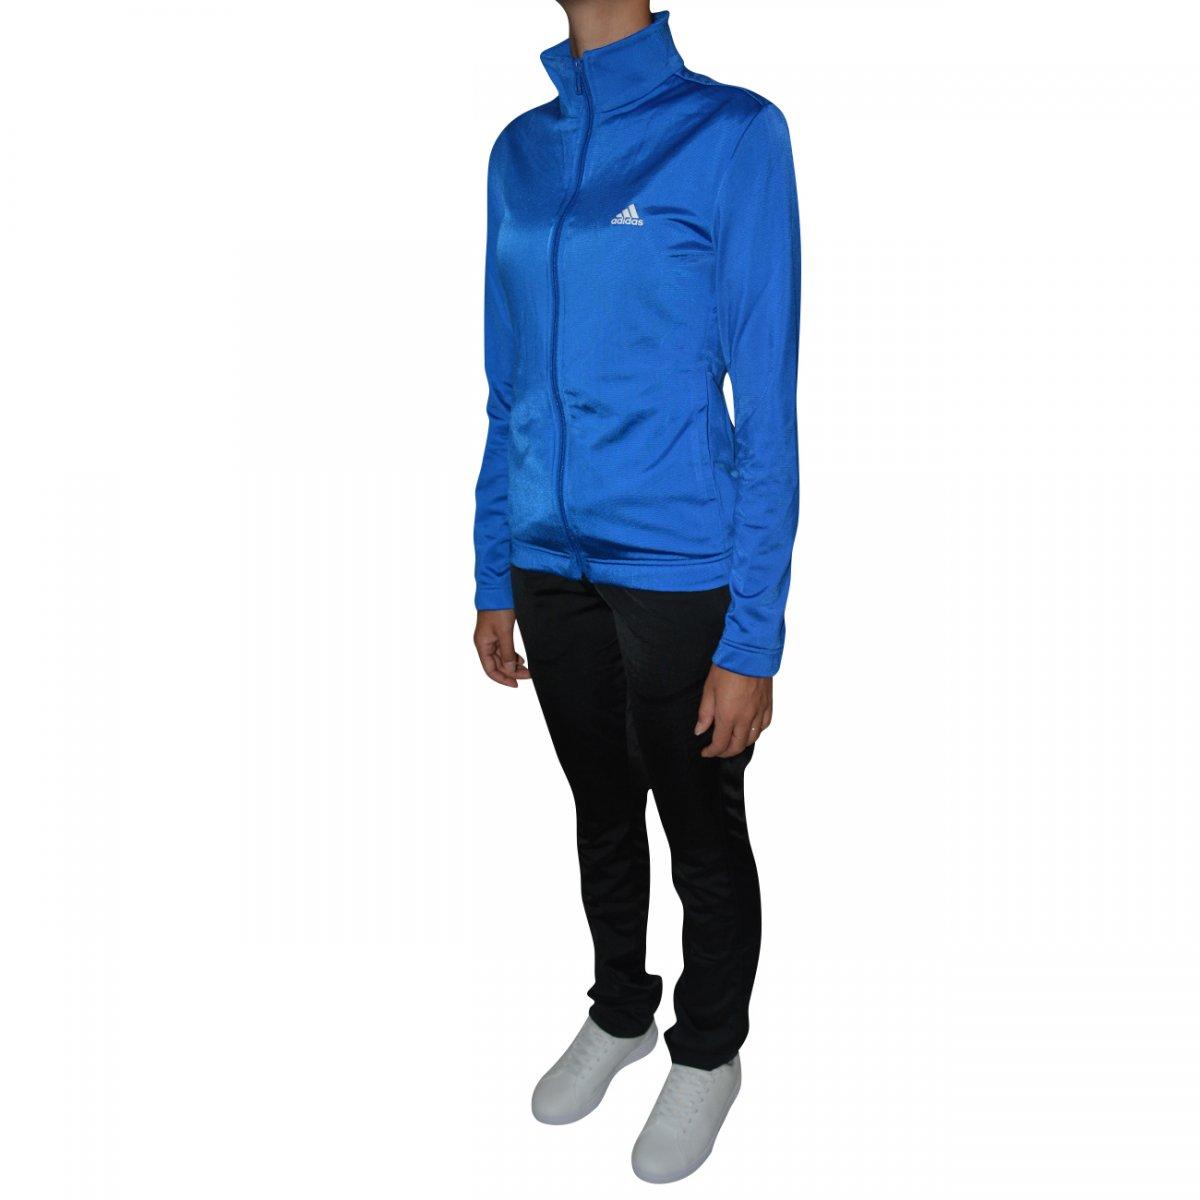 Agasalho Adidas ESS EP TS W Feminino CV4704 - Azul preto - Chuteira Nike f038d2af87f2b